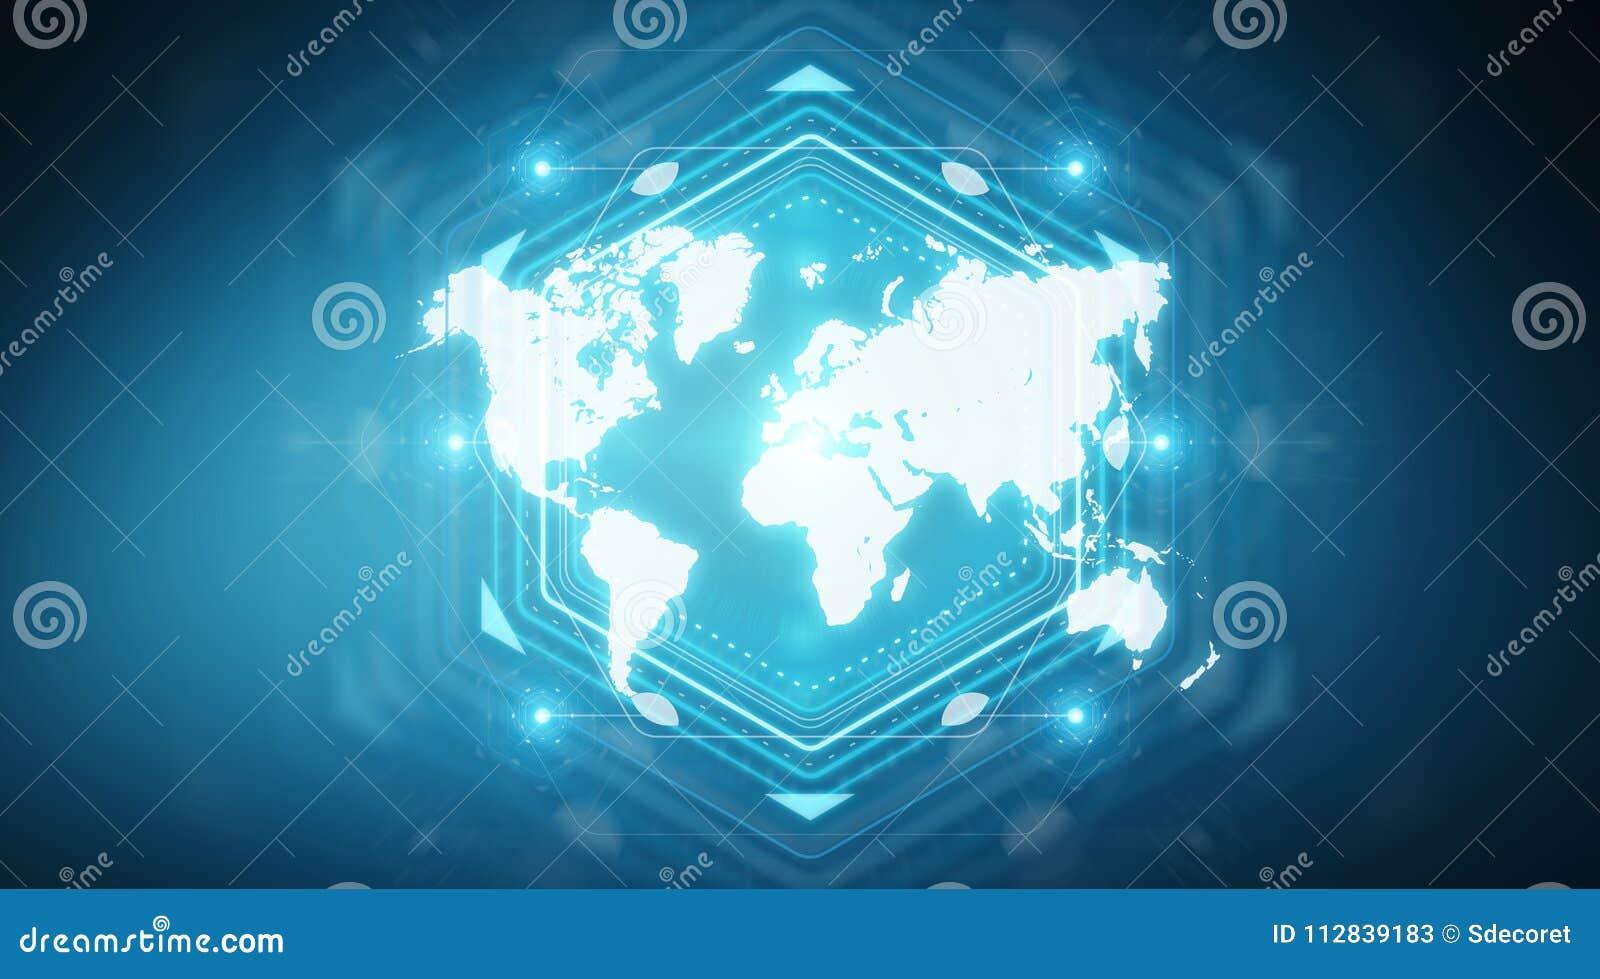 Digital World Map Screen Interface 3D Rendering Stock Illustration